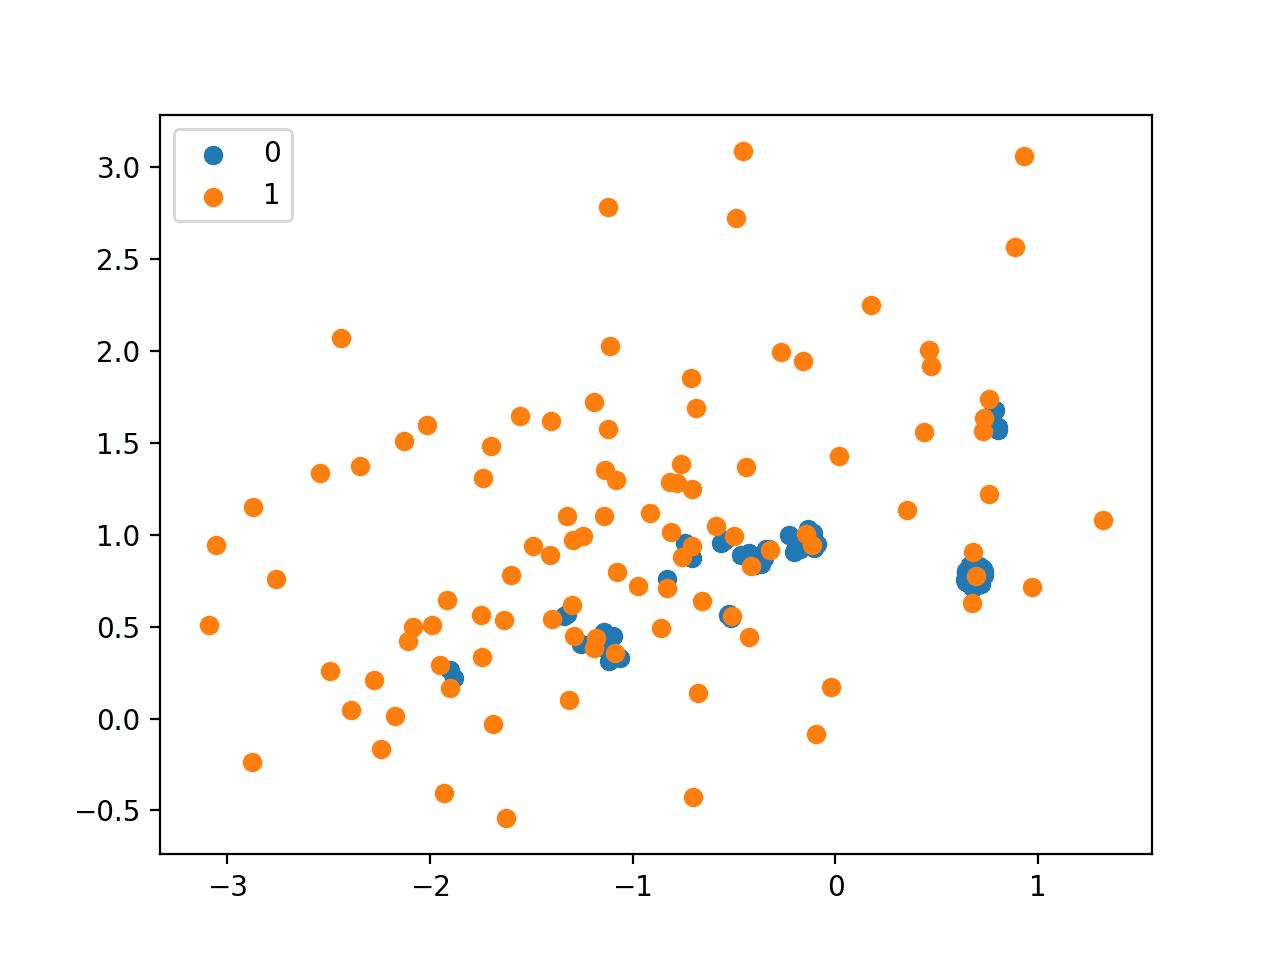 Scatter Plot of Imbalanced Dataset Undersampled with NearMiss-1